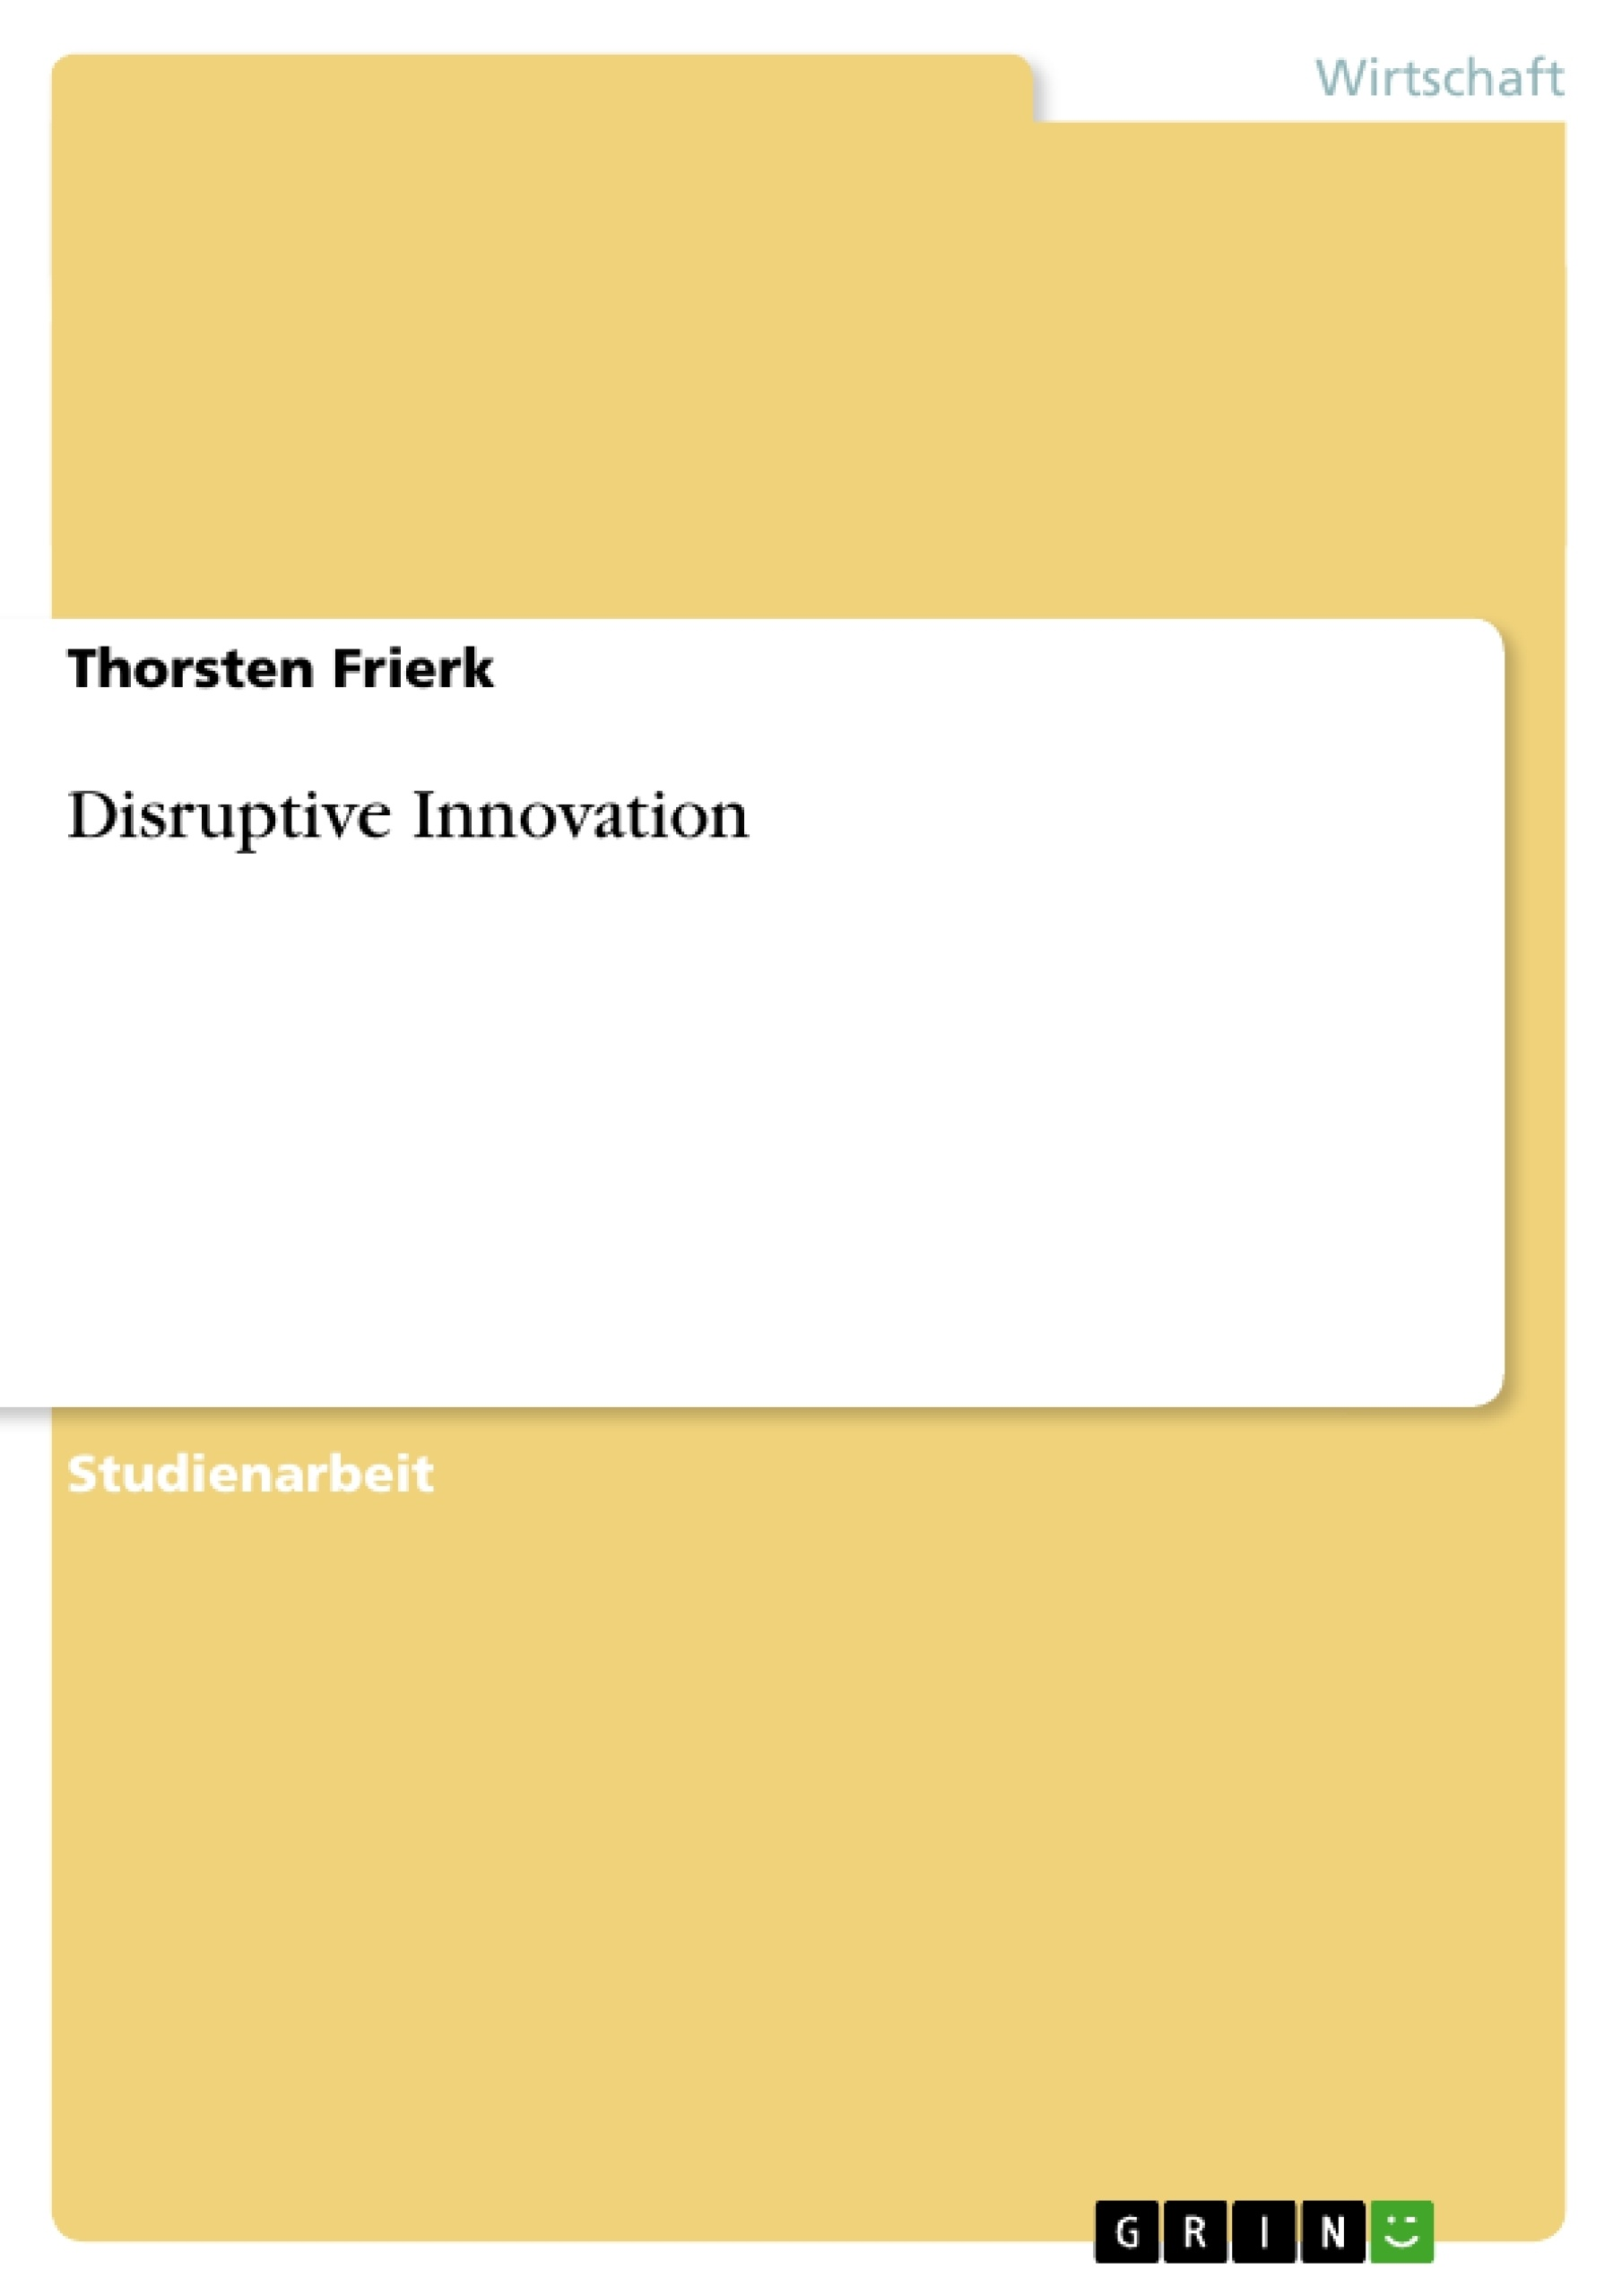 Titel: Disruptive Innovation